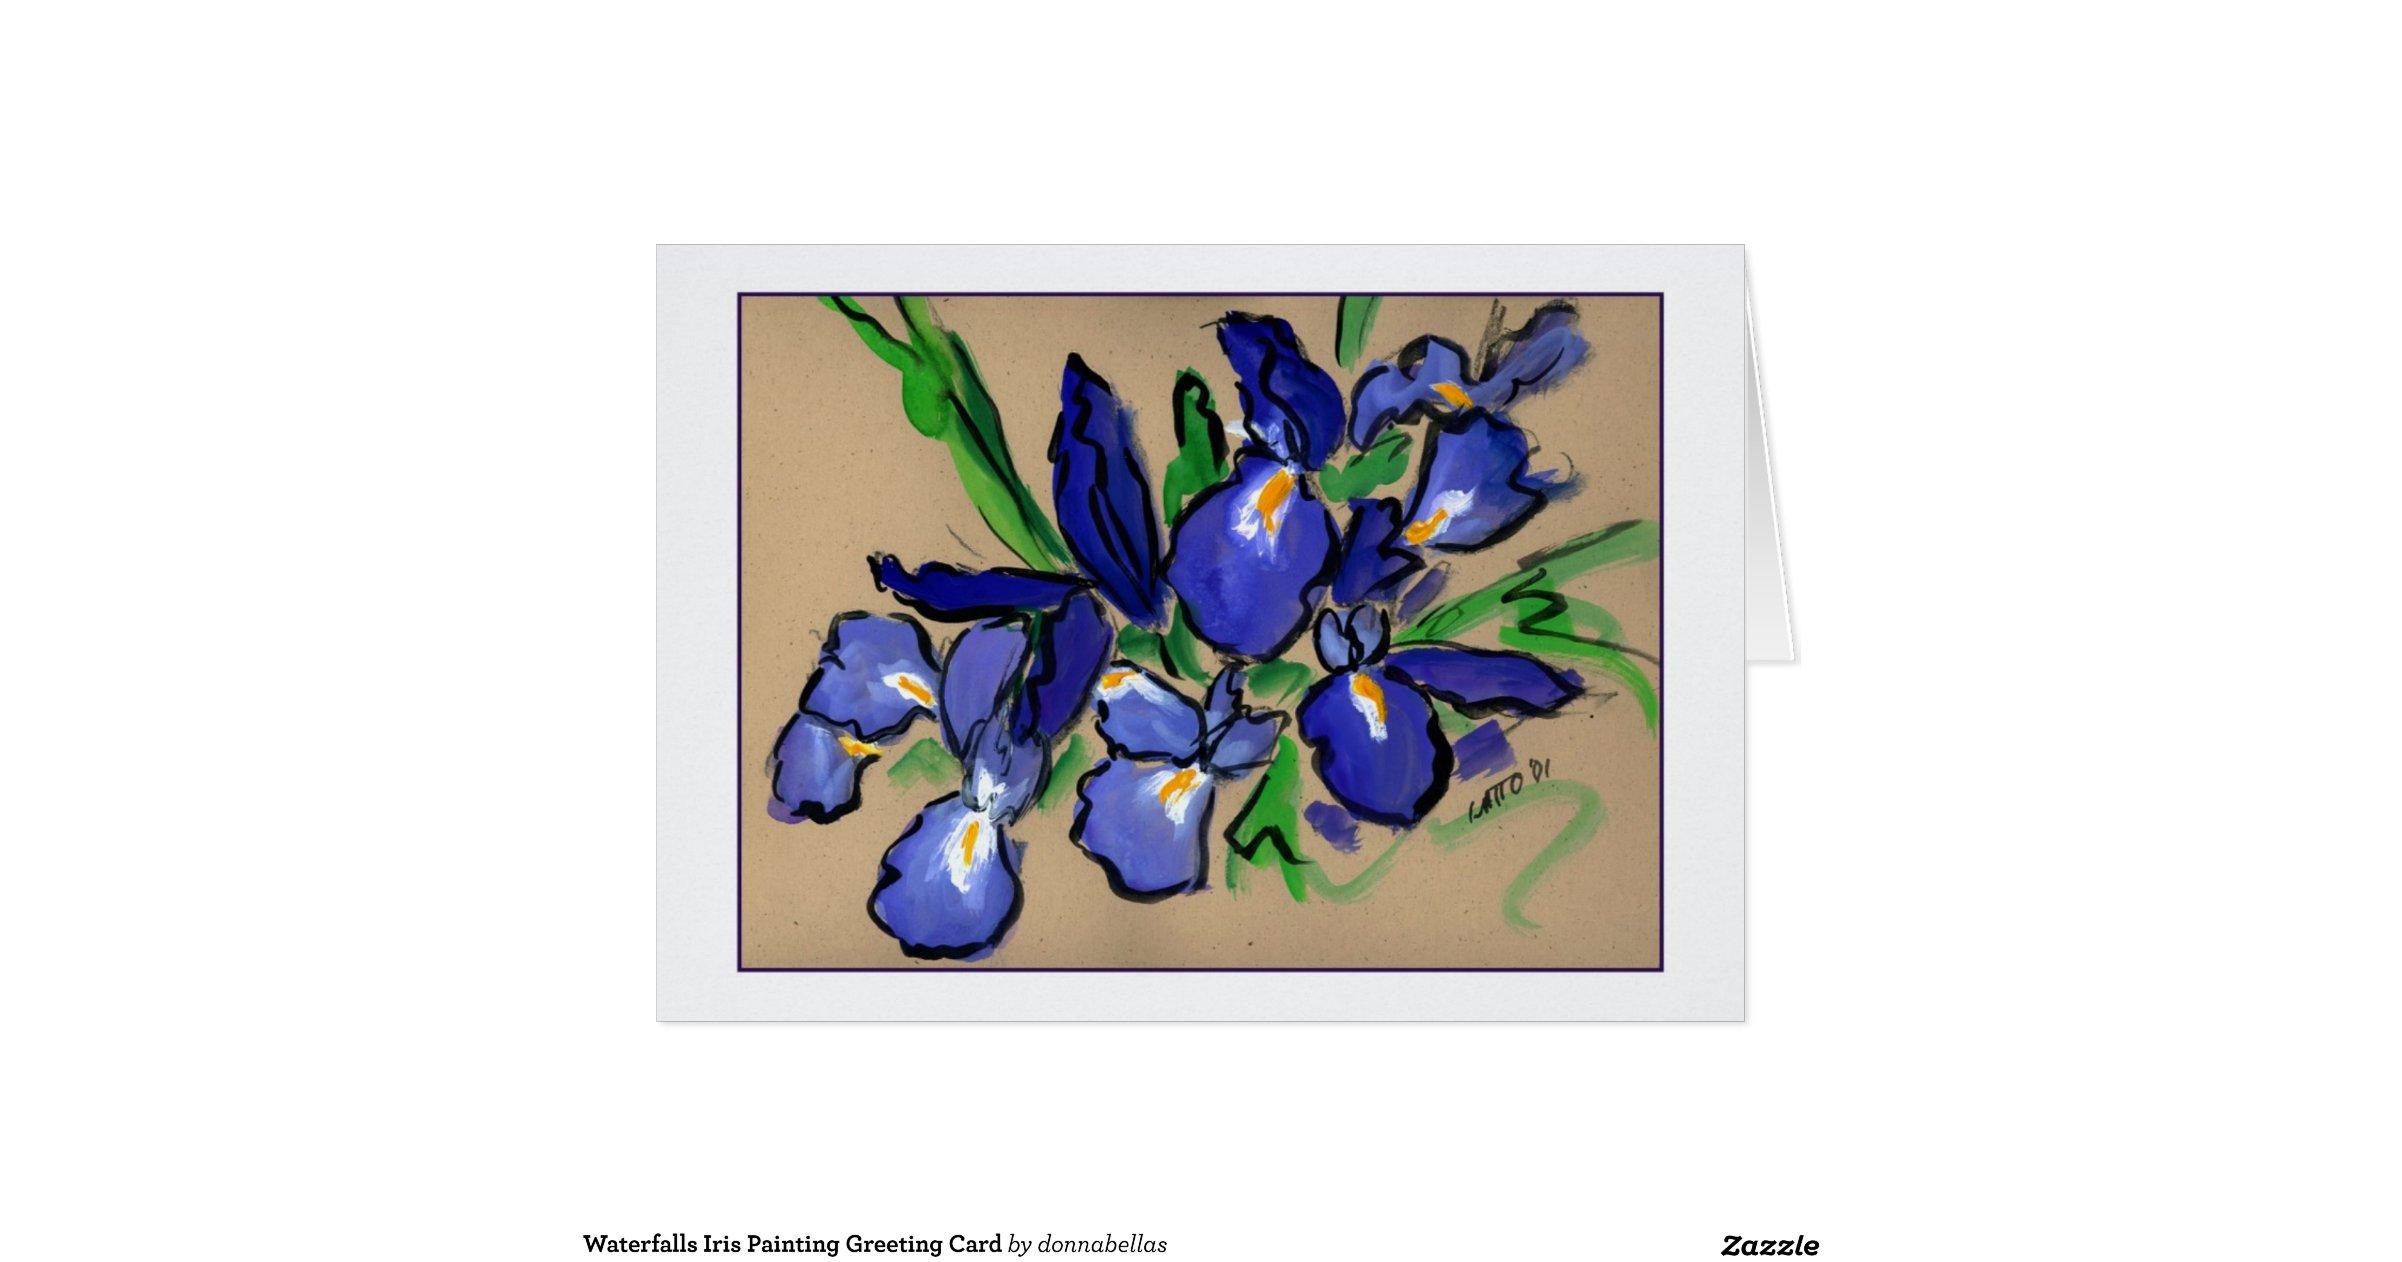 Waterfalls Iris Painting Greeting Card | Zazzle